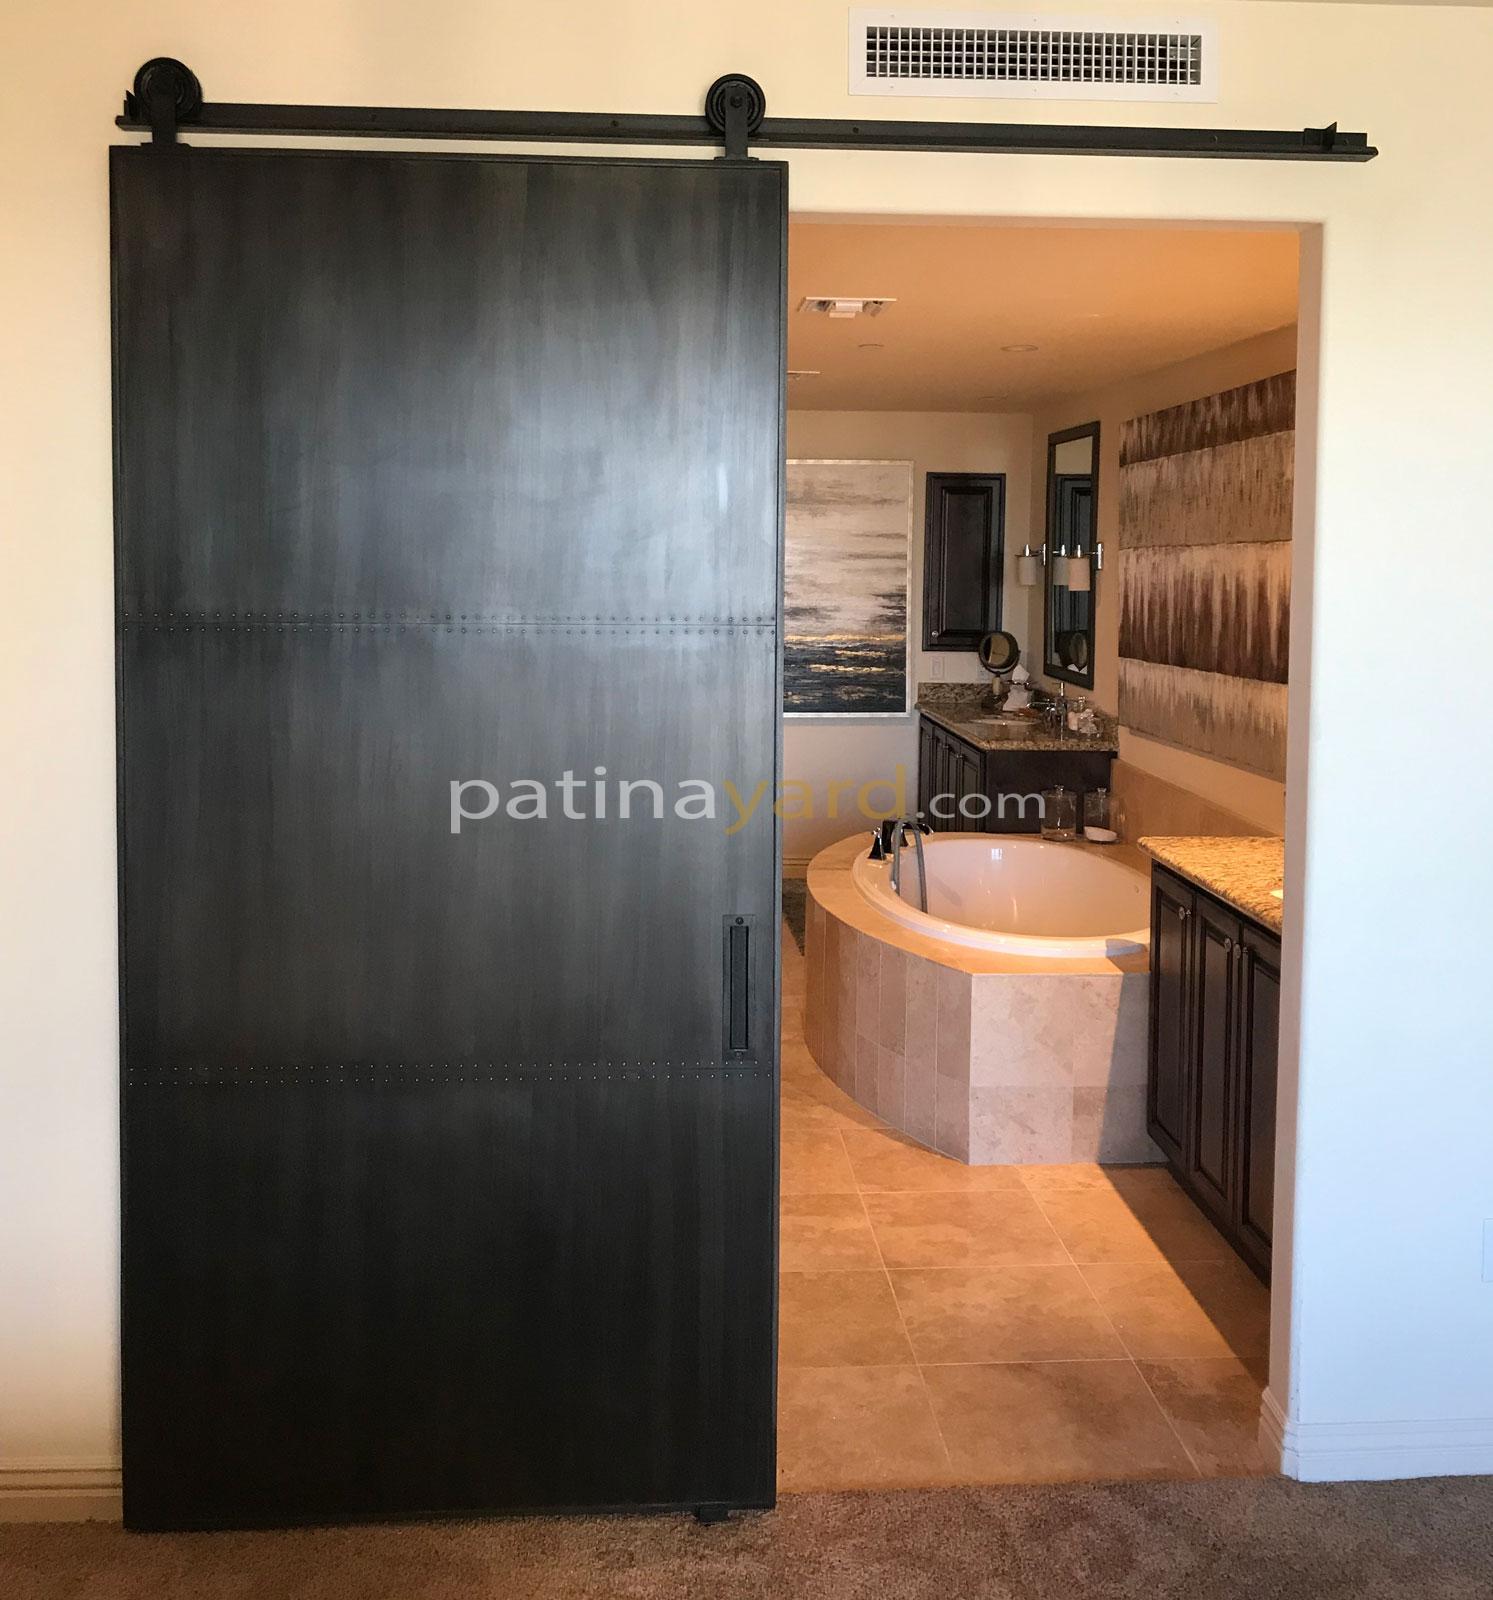 metal barn door with a patina finish and custom hardware